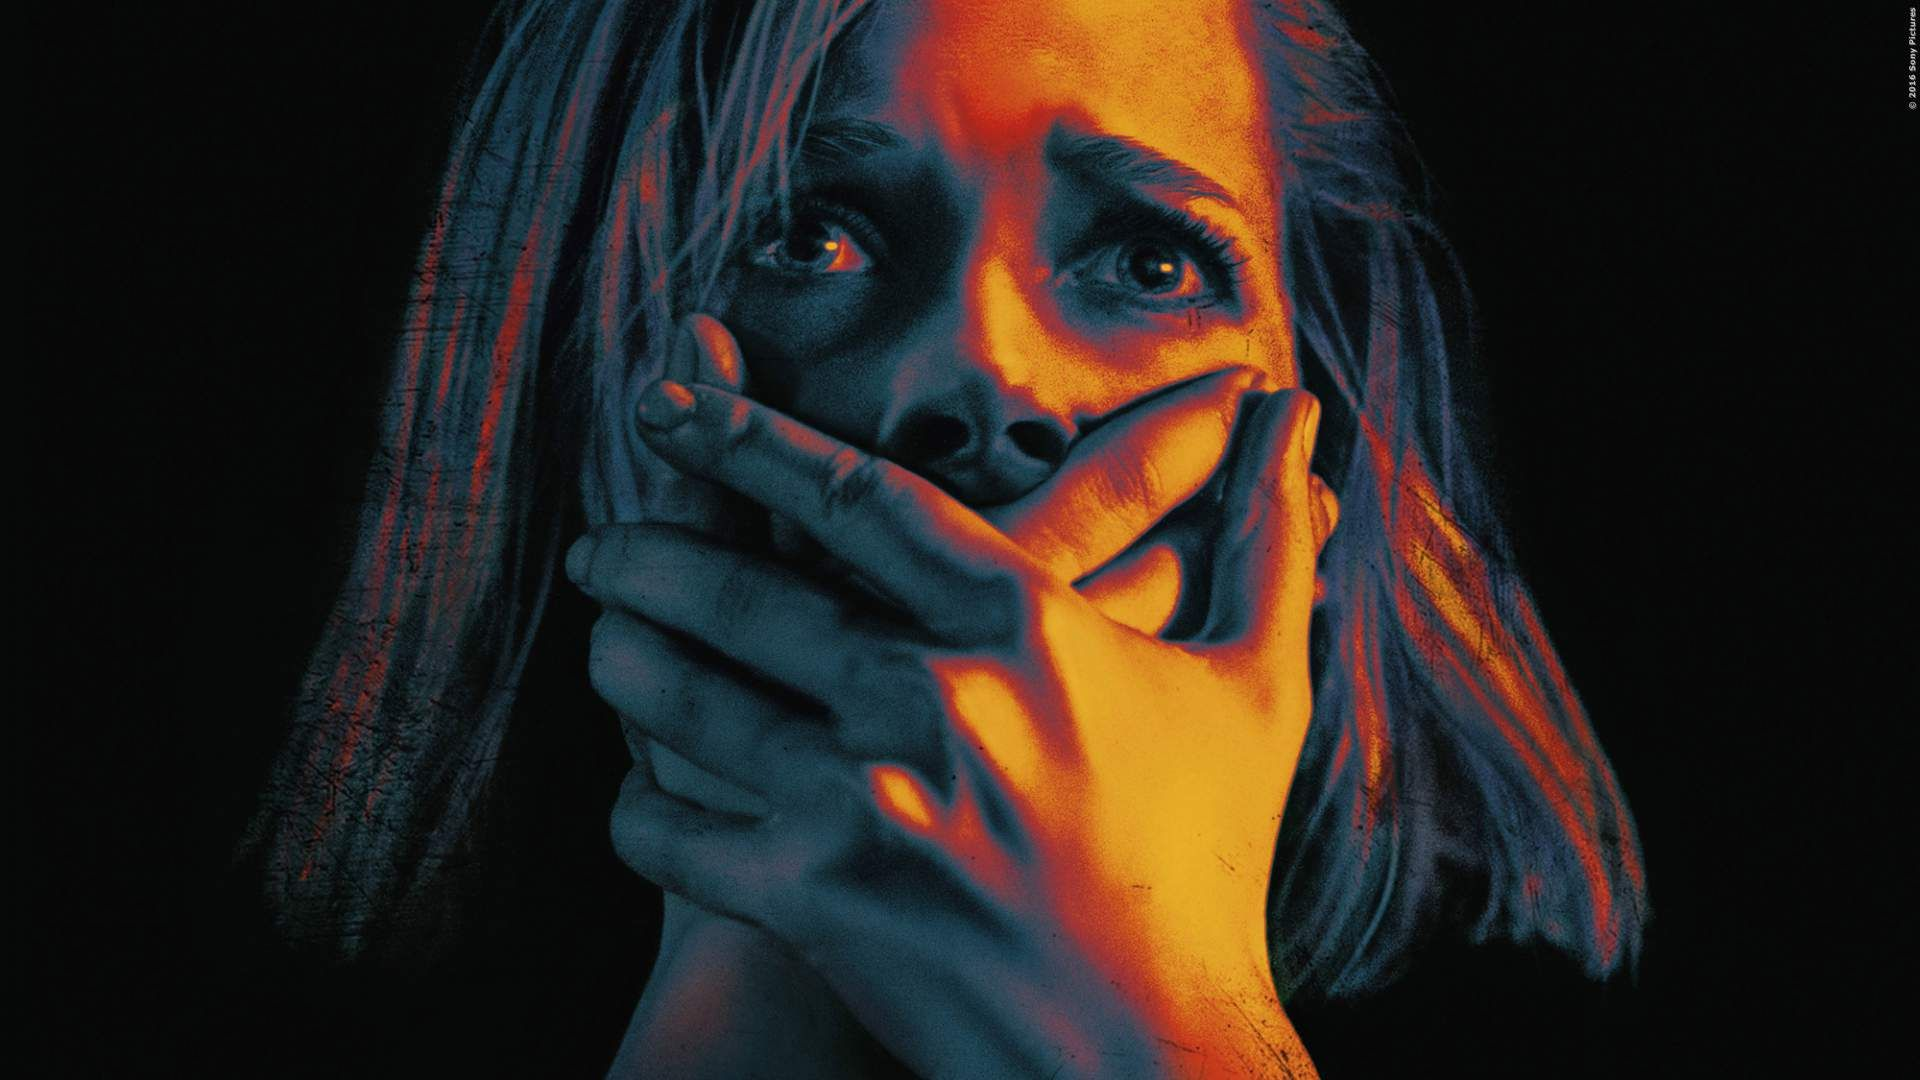 Aktueller Horrorfilm